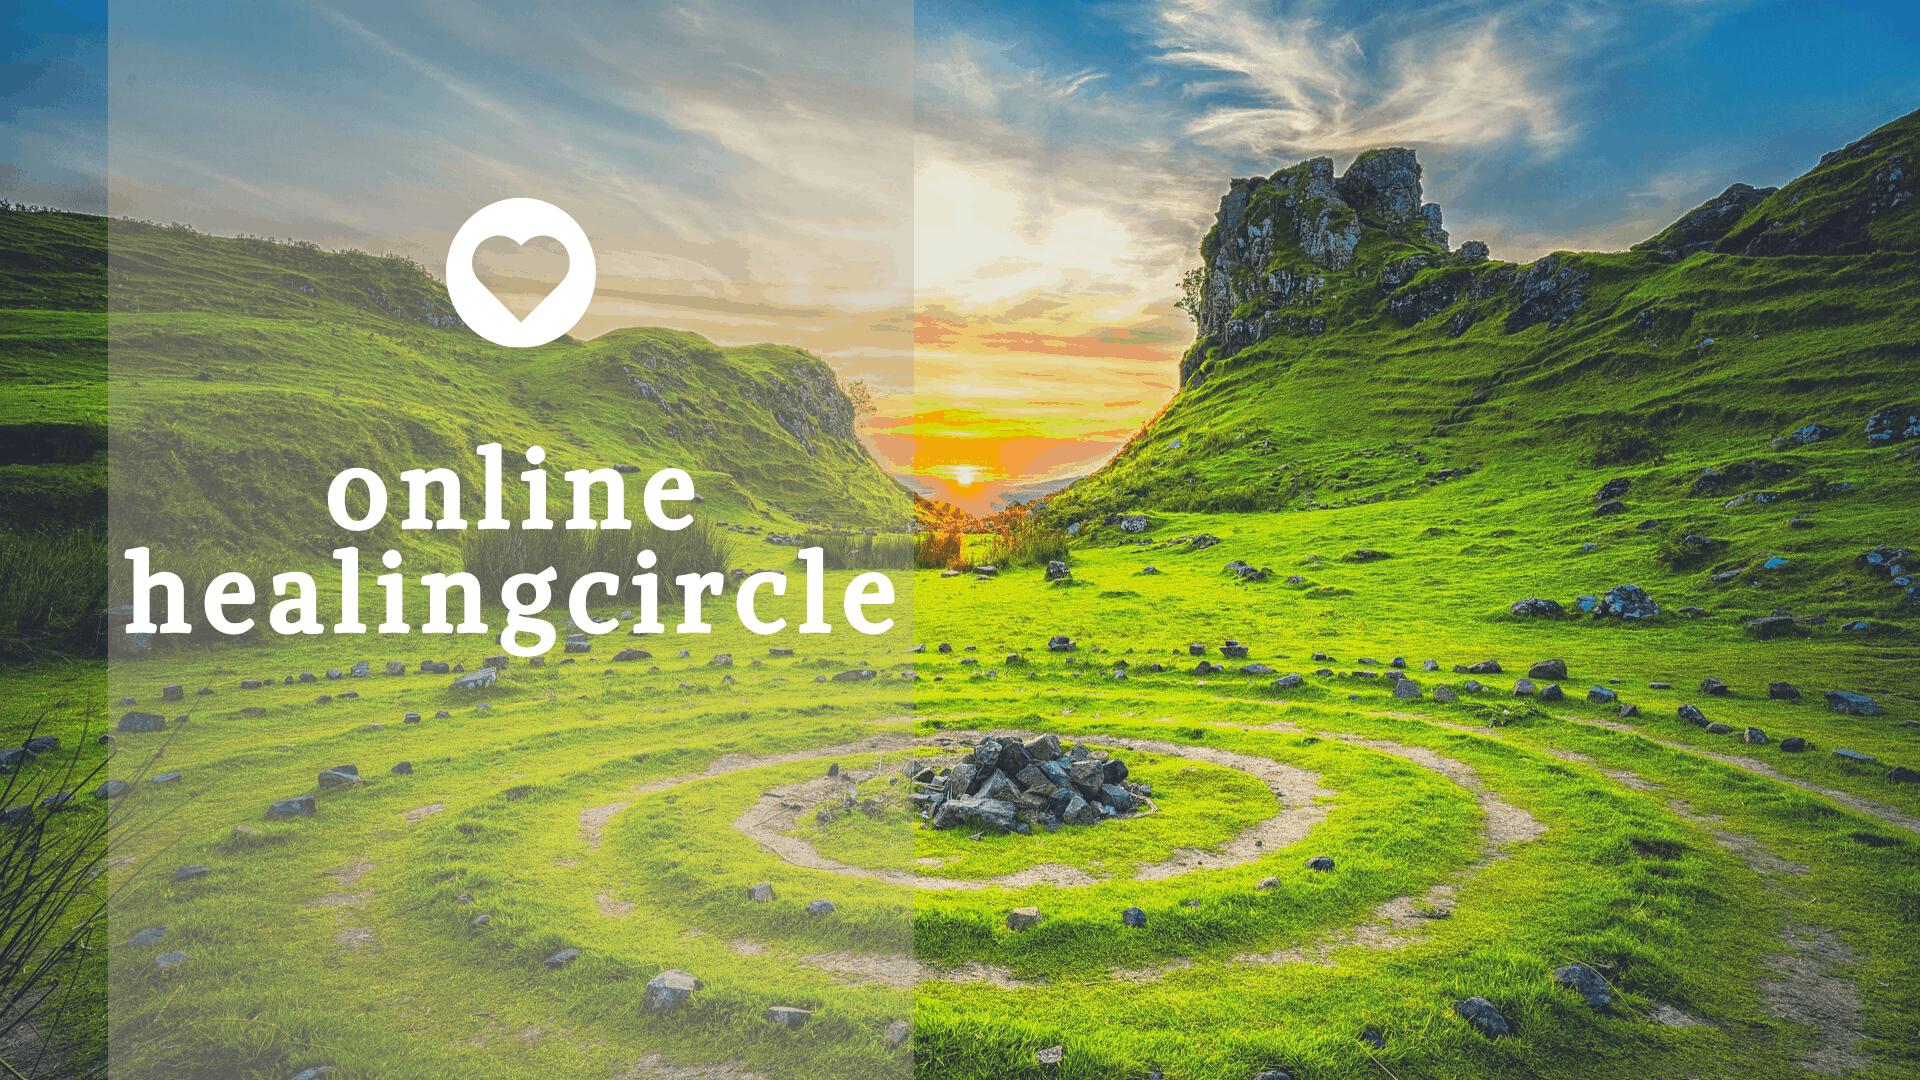 Online healingcircle (3)